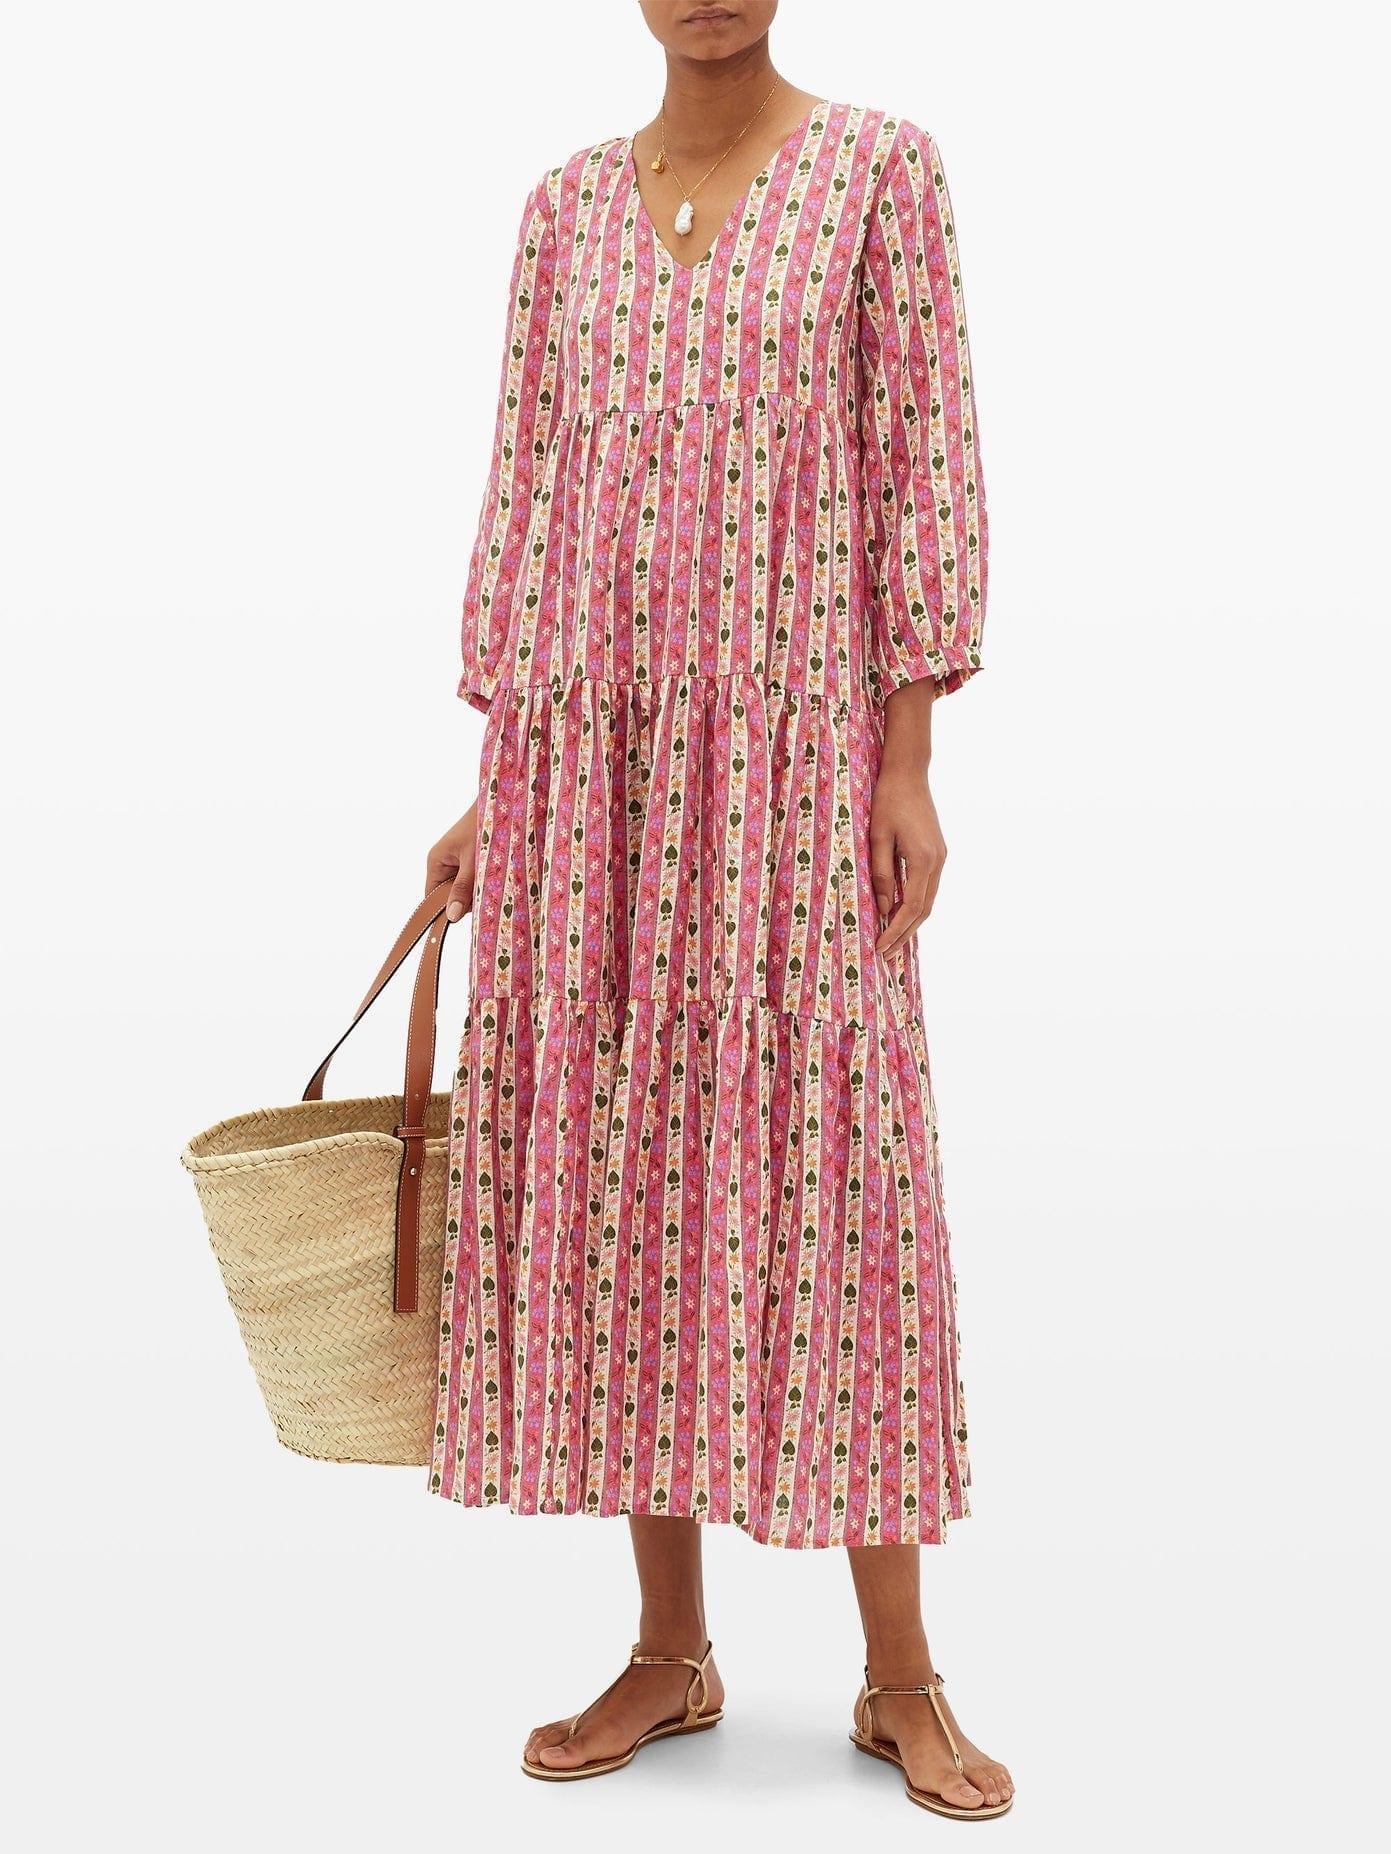 MUZUNGU SISTERS Floral-Striped Linen Dress